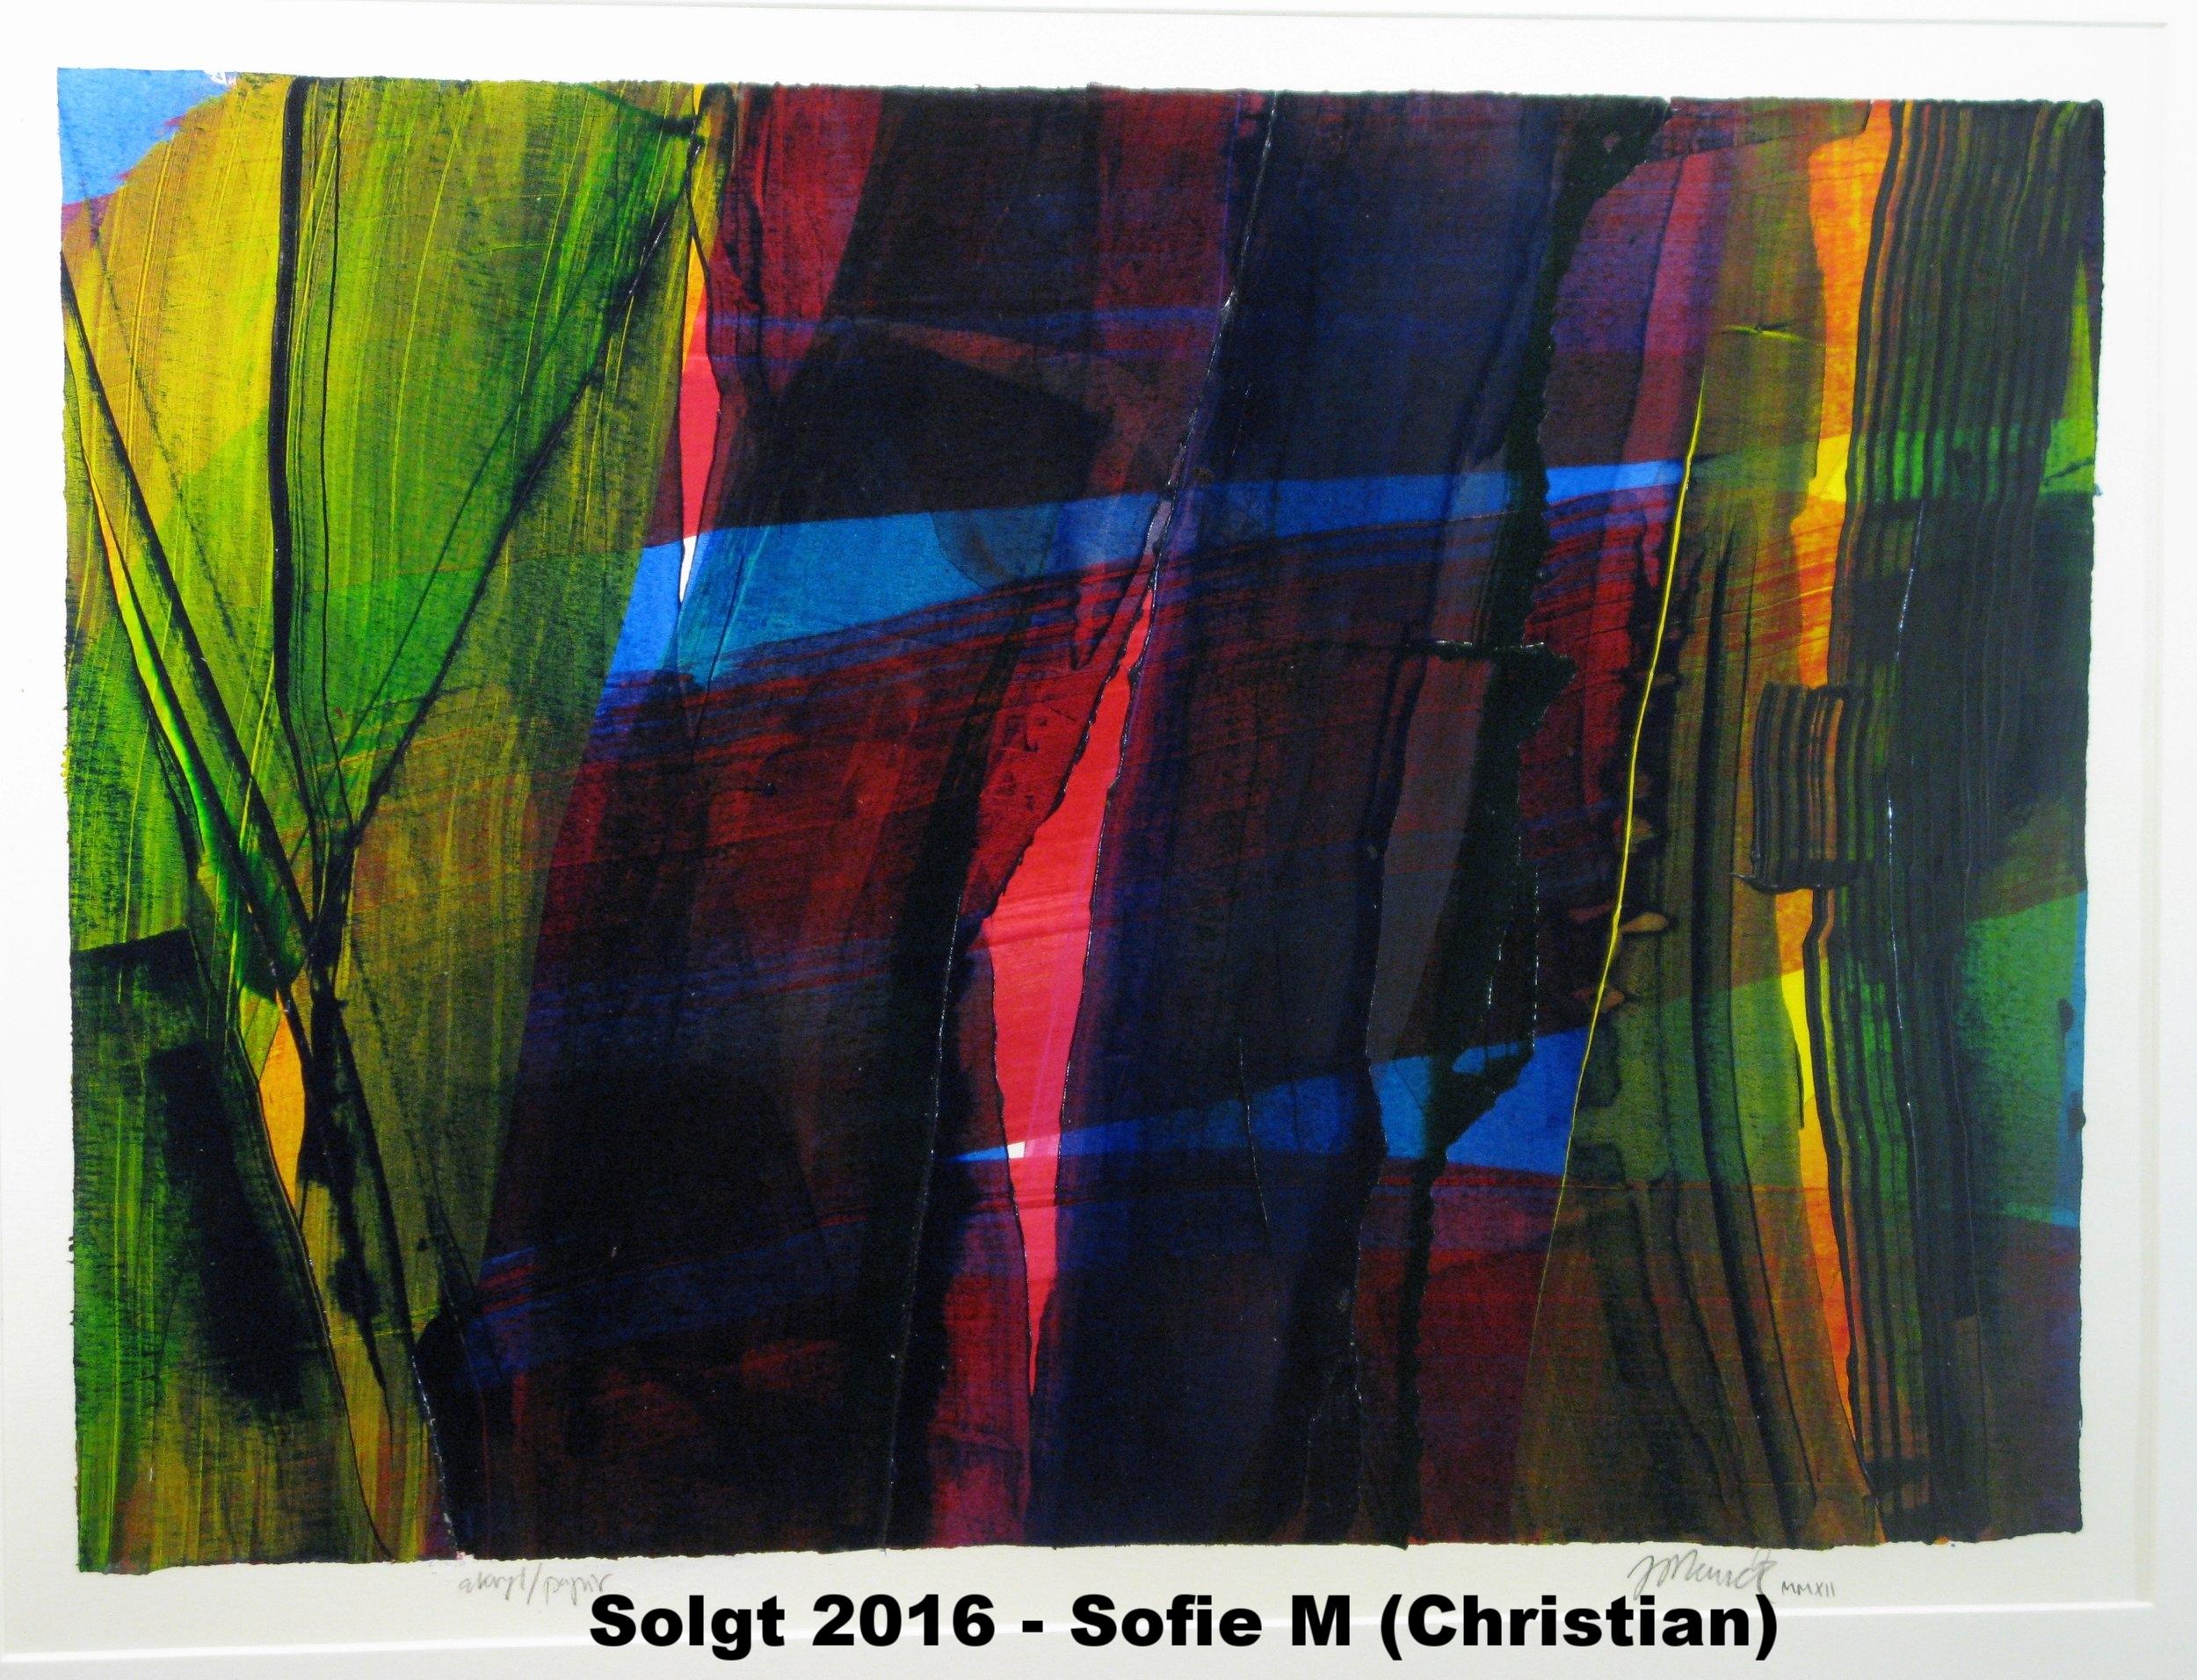 Solgt 2016 - Sofie Michelsen bryllupsgave (Christian)